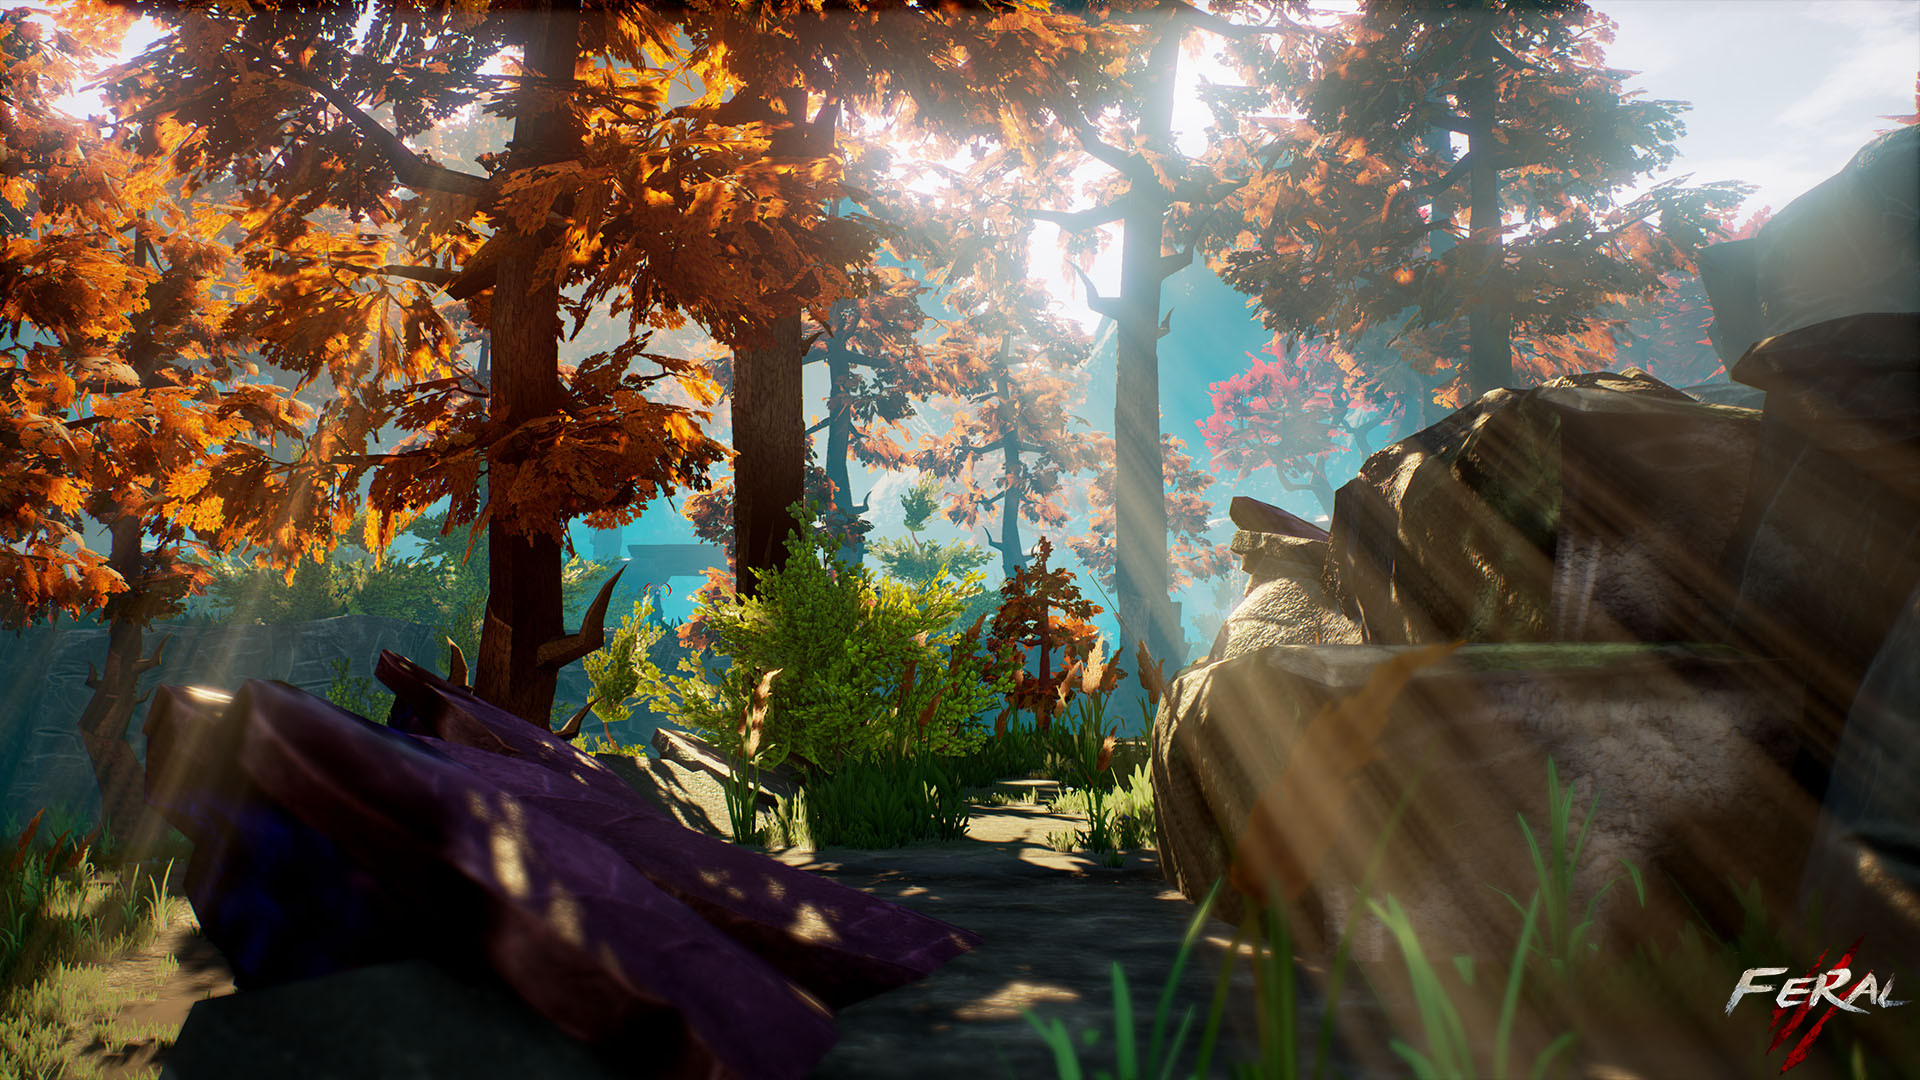 Chloe ravallec forest